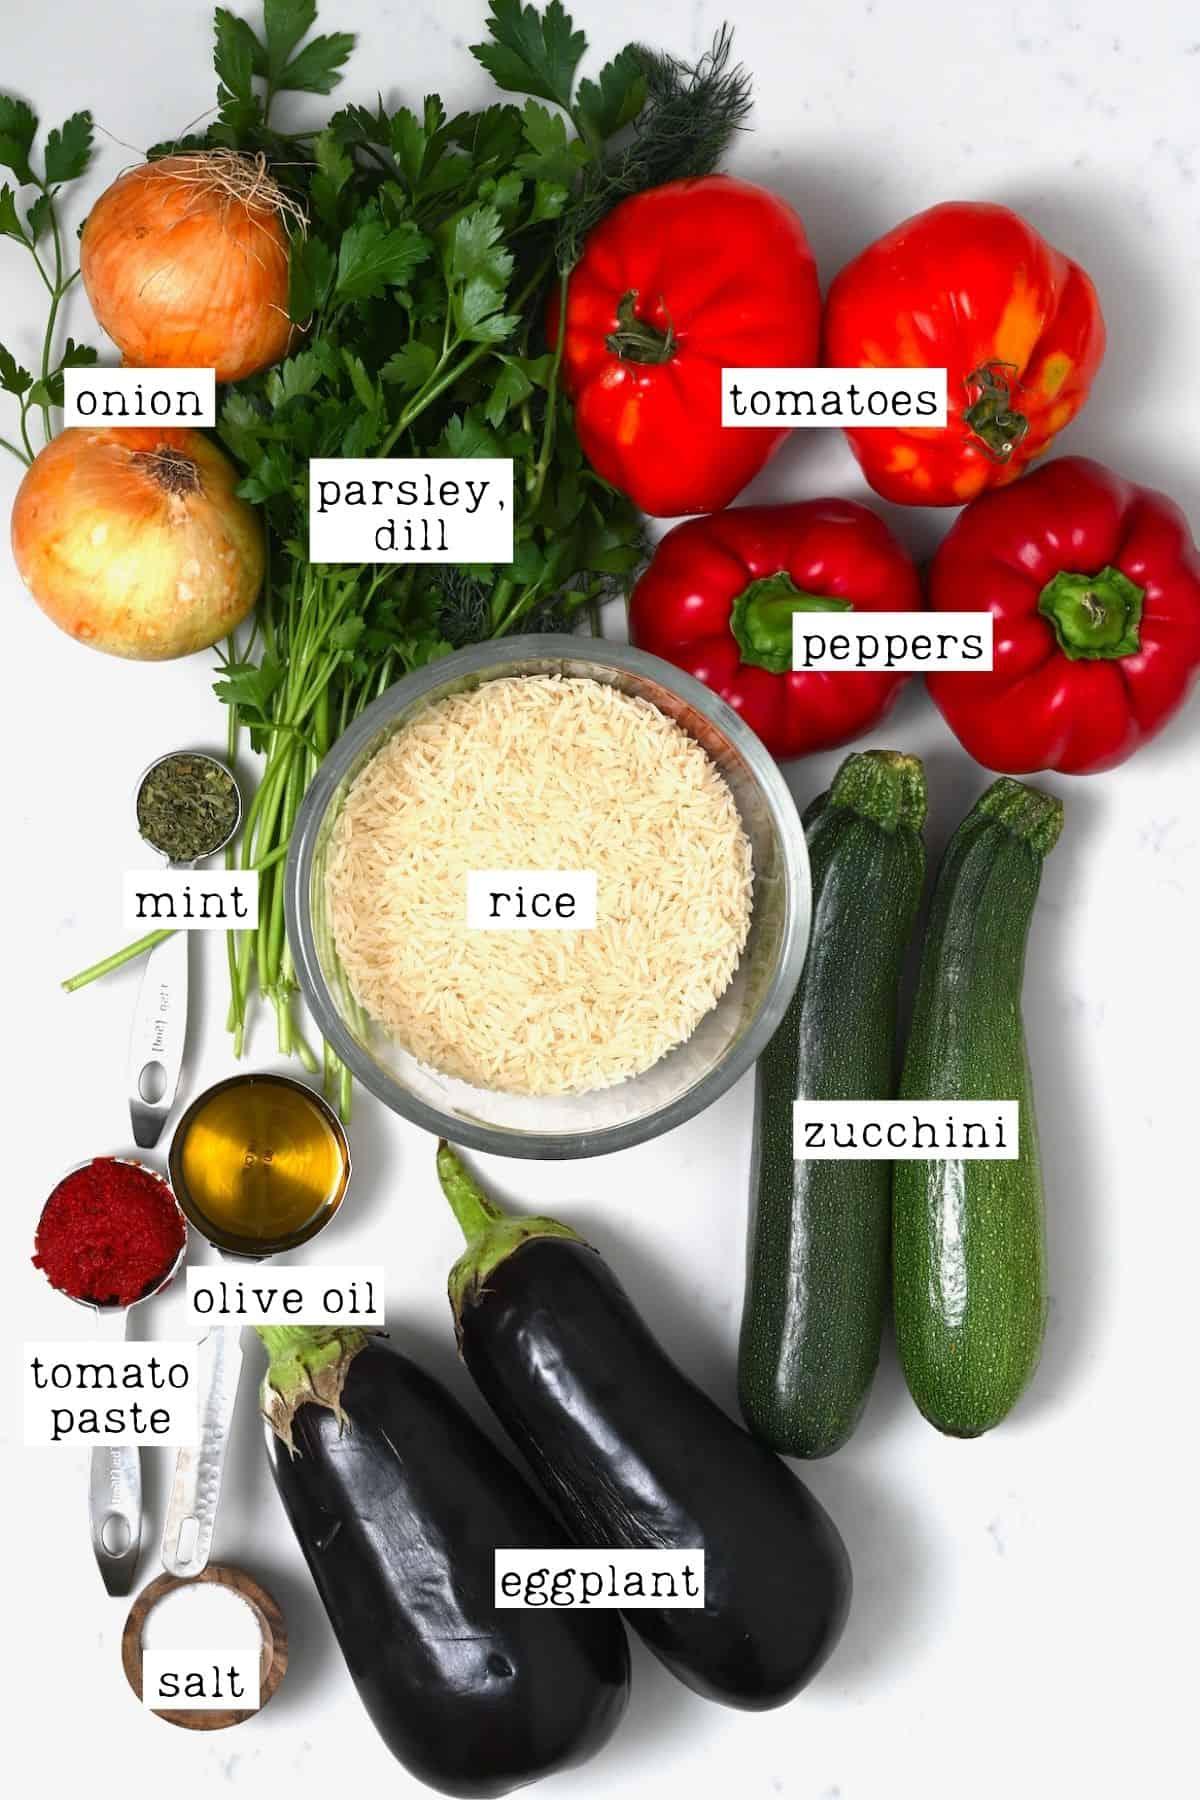 Ingredients for stuffed veggies